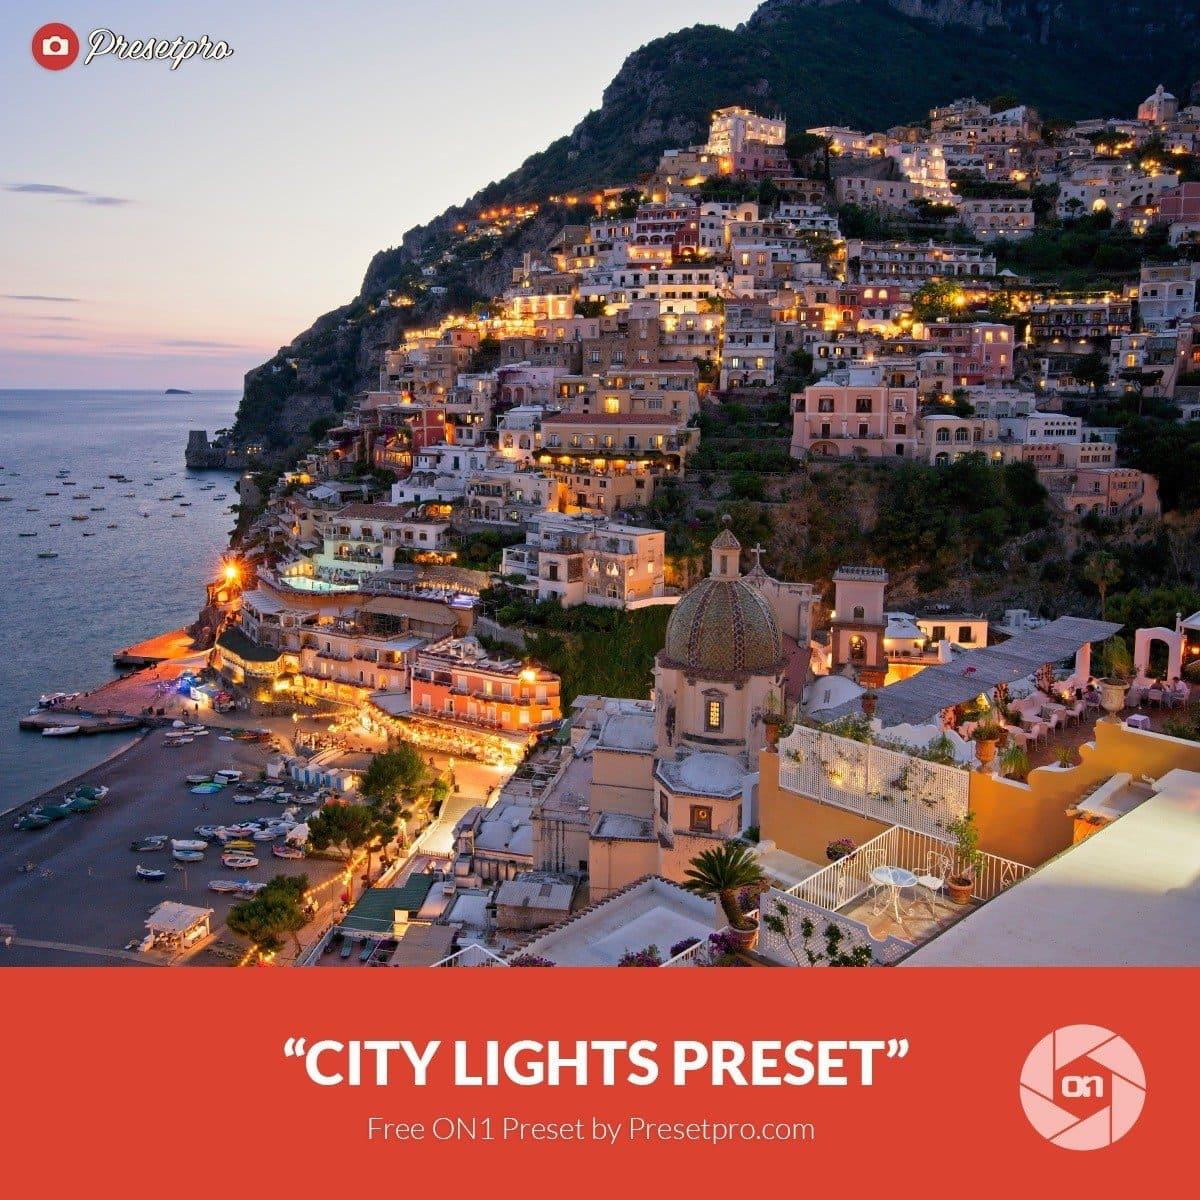 Free-On1-Preset-City-Lights-Presetpro.com